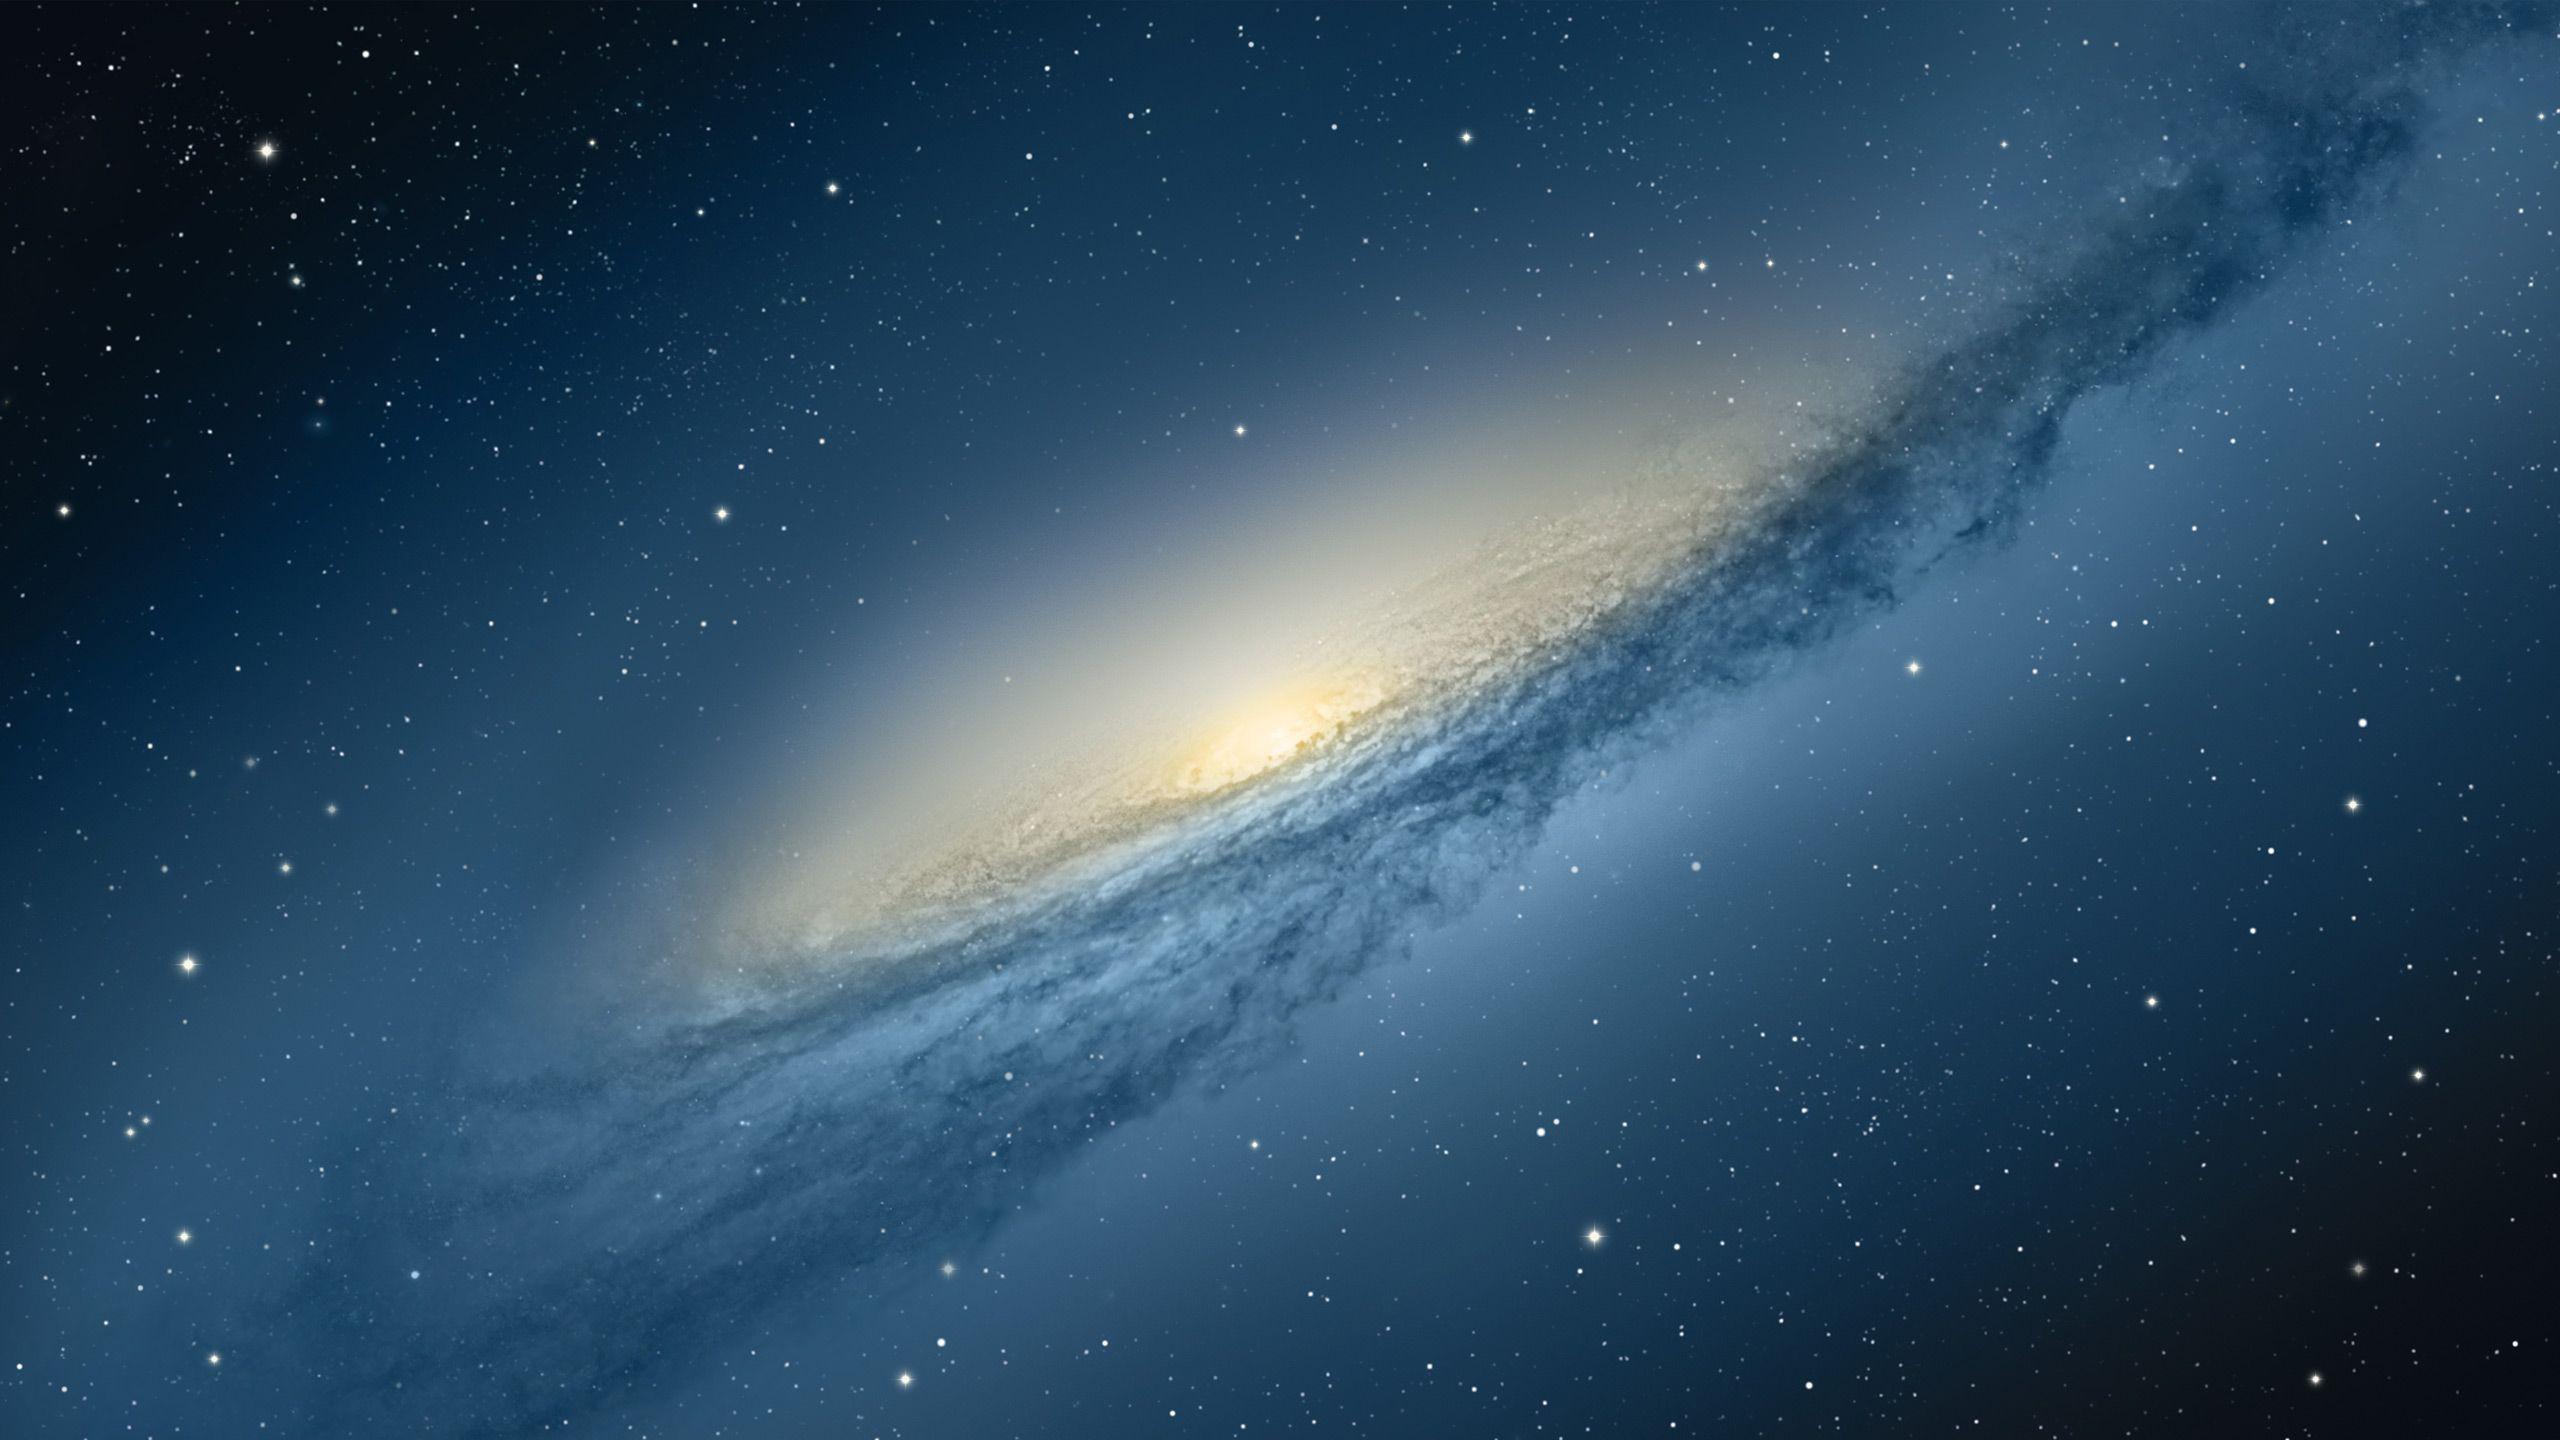 Apple Macbook Os X Mountain Lion Wallpaper Blue Galaxy Wallpaper Galaxy Wallpaper Wallpaper Space